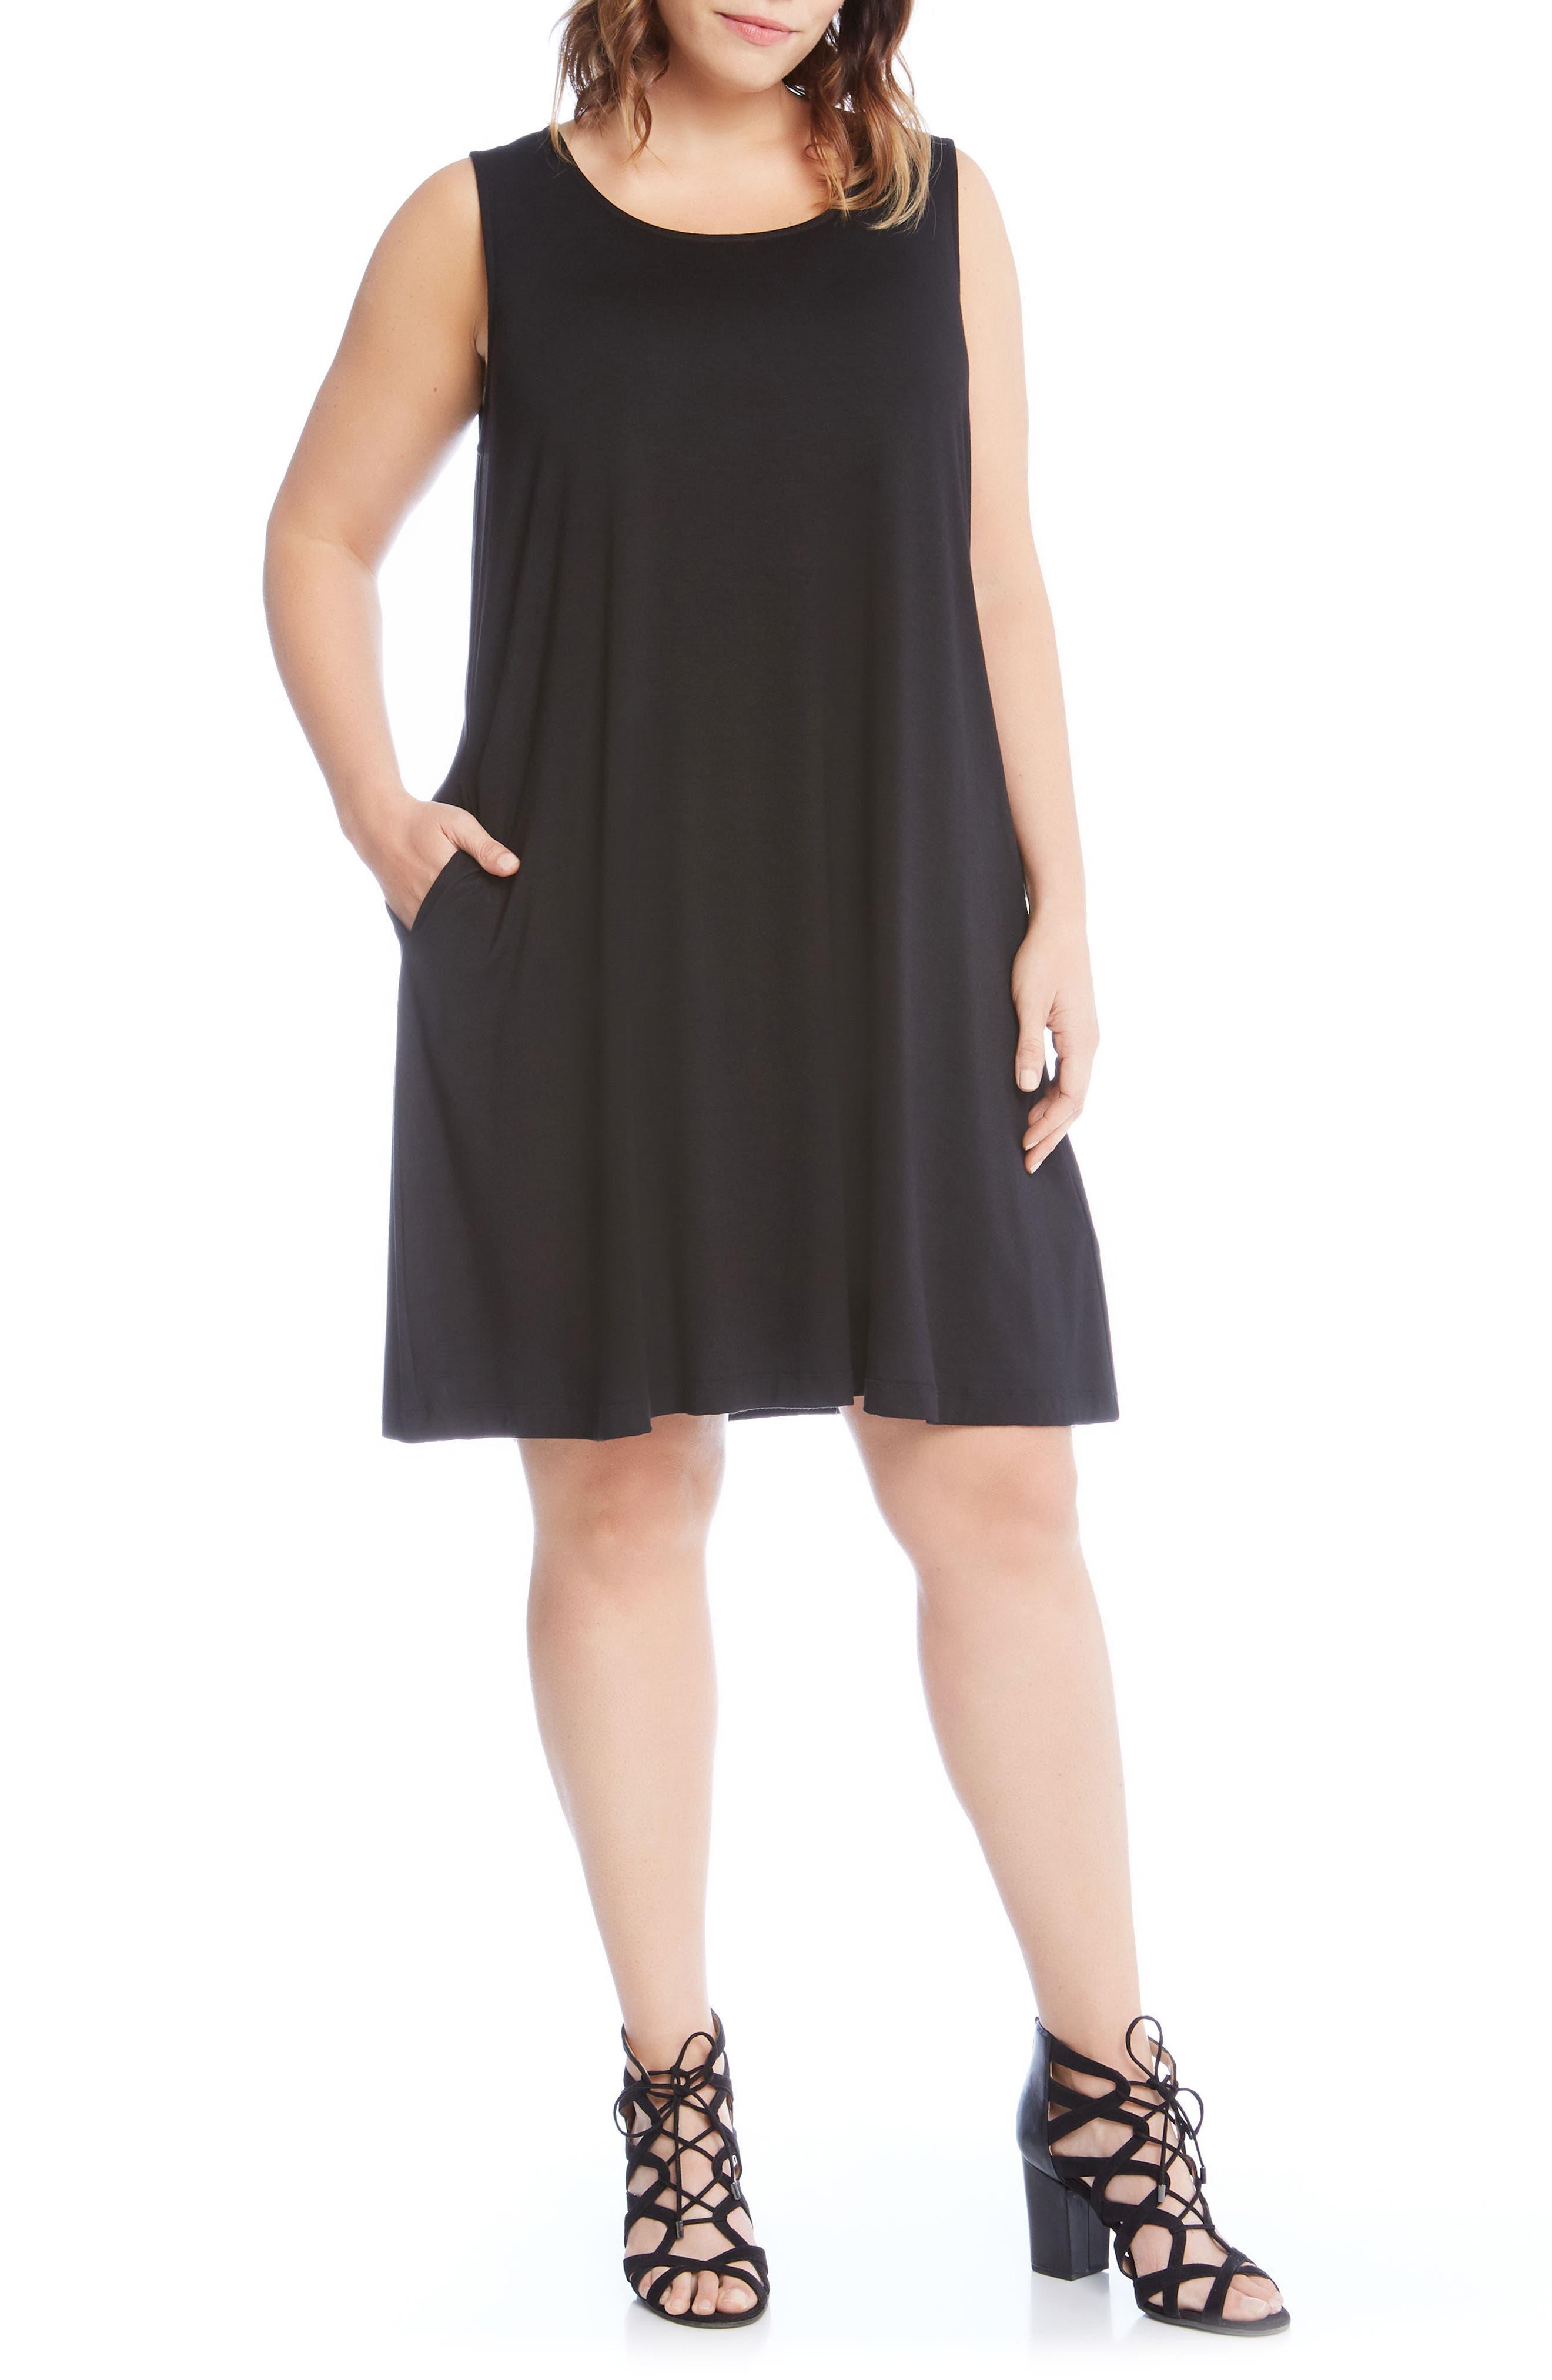 Chloe Swing Dress,                             Main thumbnail 1, color,                             Black